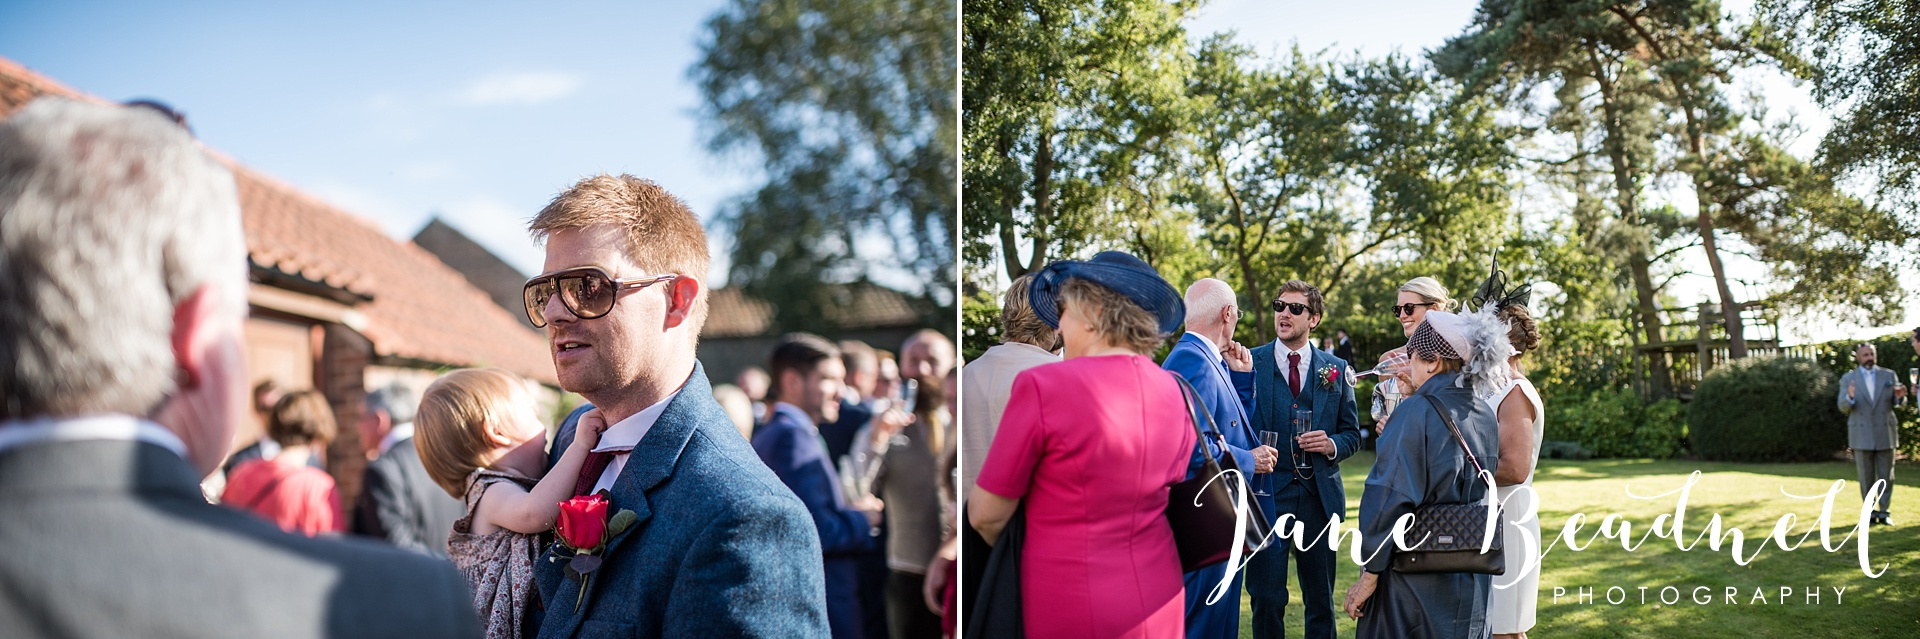 fine-art-wedding-photographer-jane-beadnell-yorkshire-wedding-photographer_0079